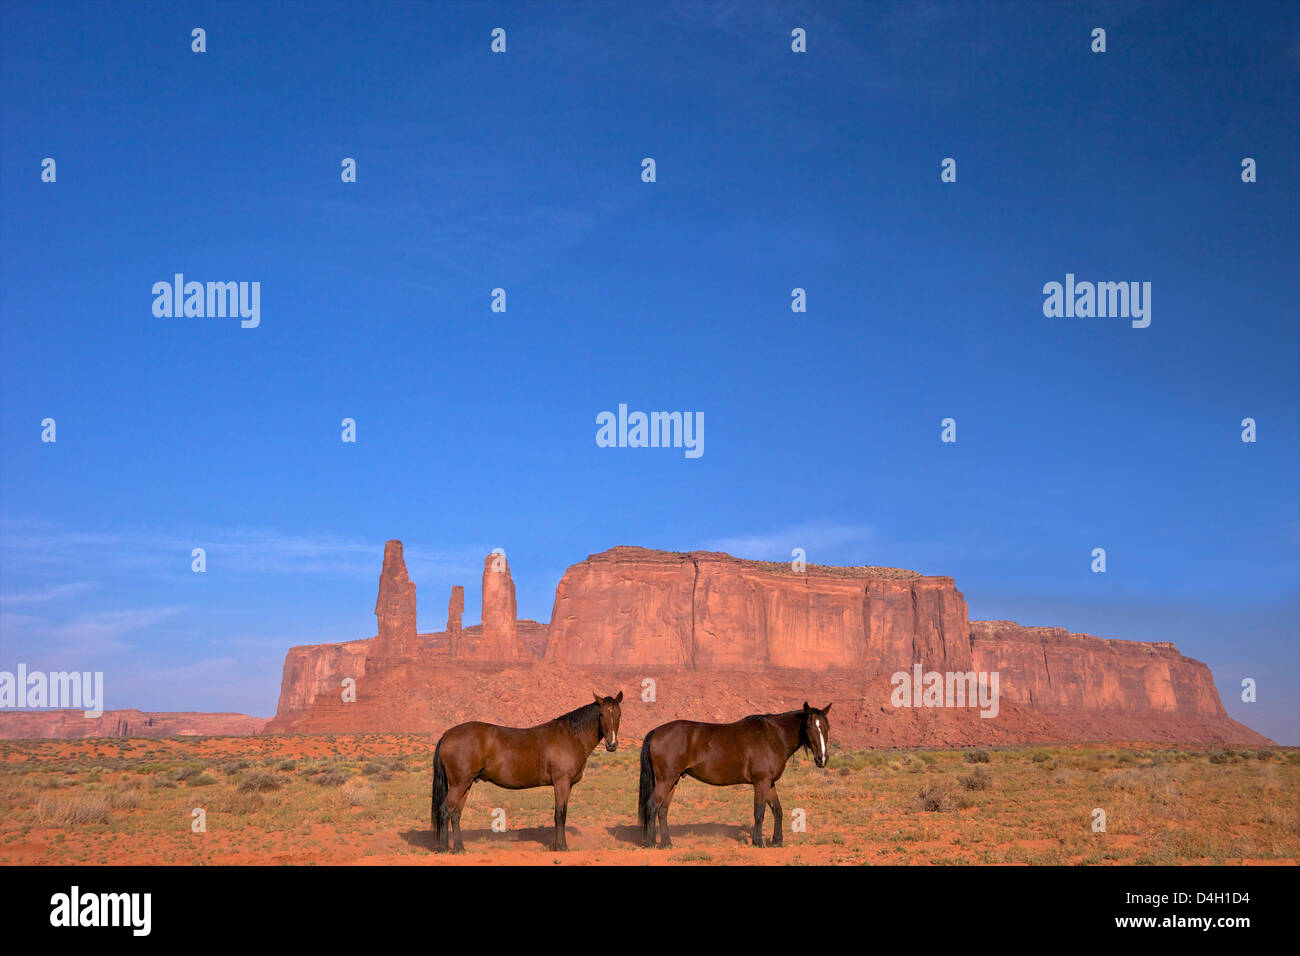 Two Navajo horses, Monument Valley Navajo Tribal Park, Utah, USA - Stock Image